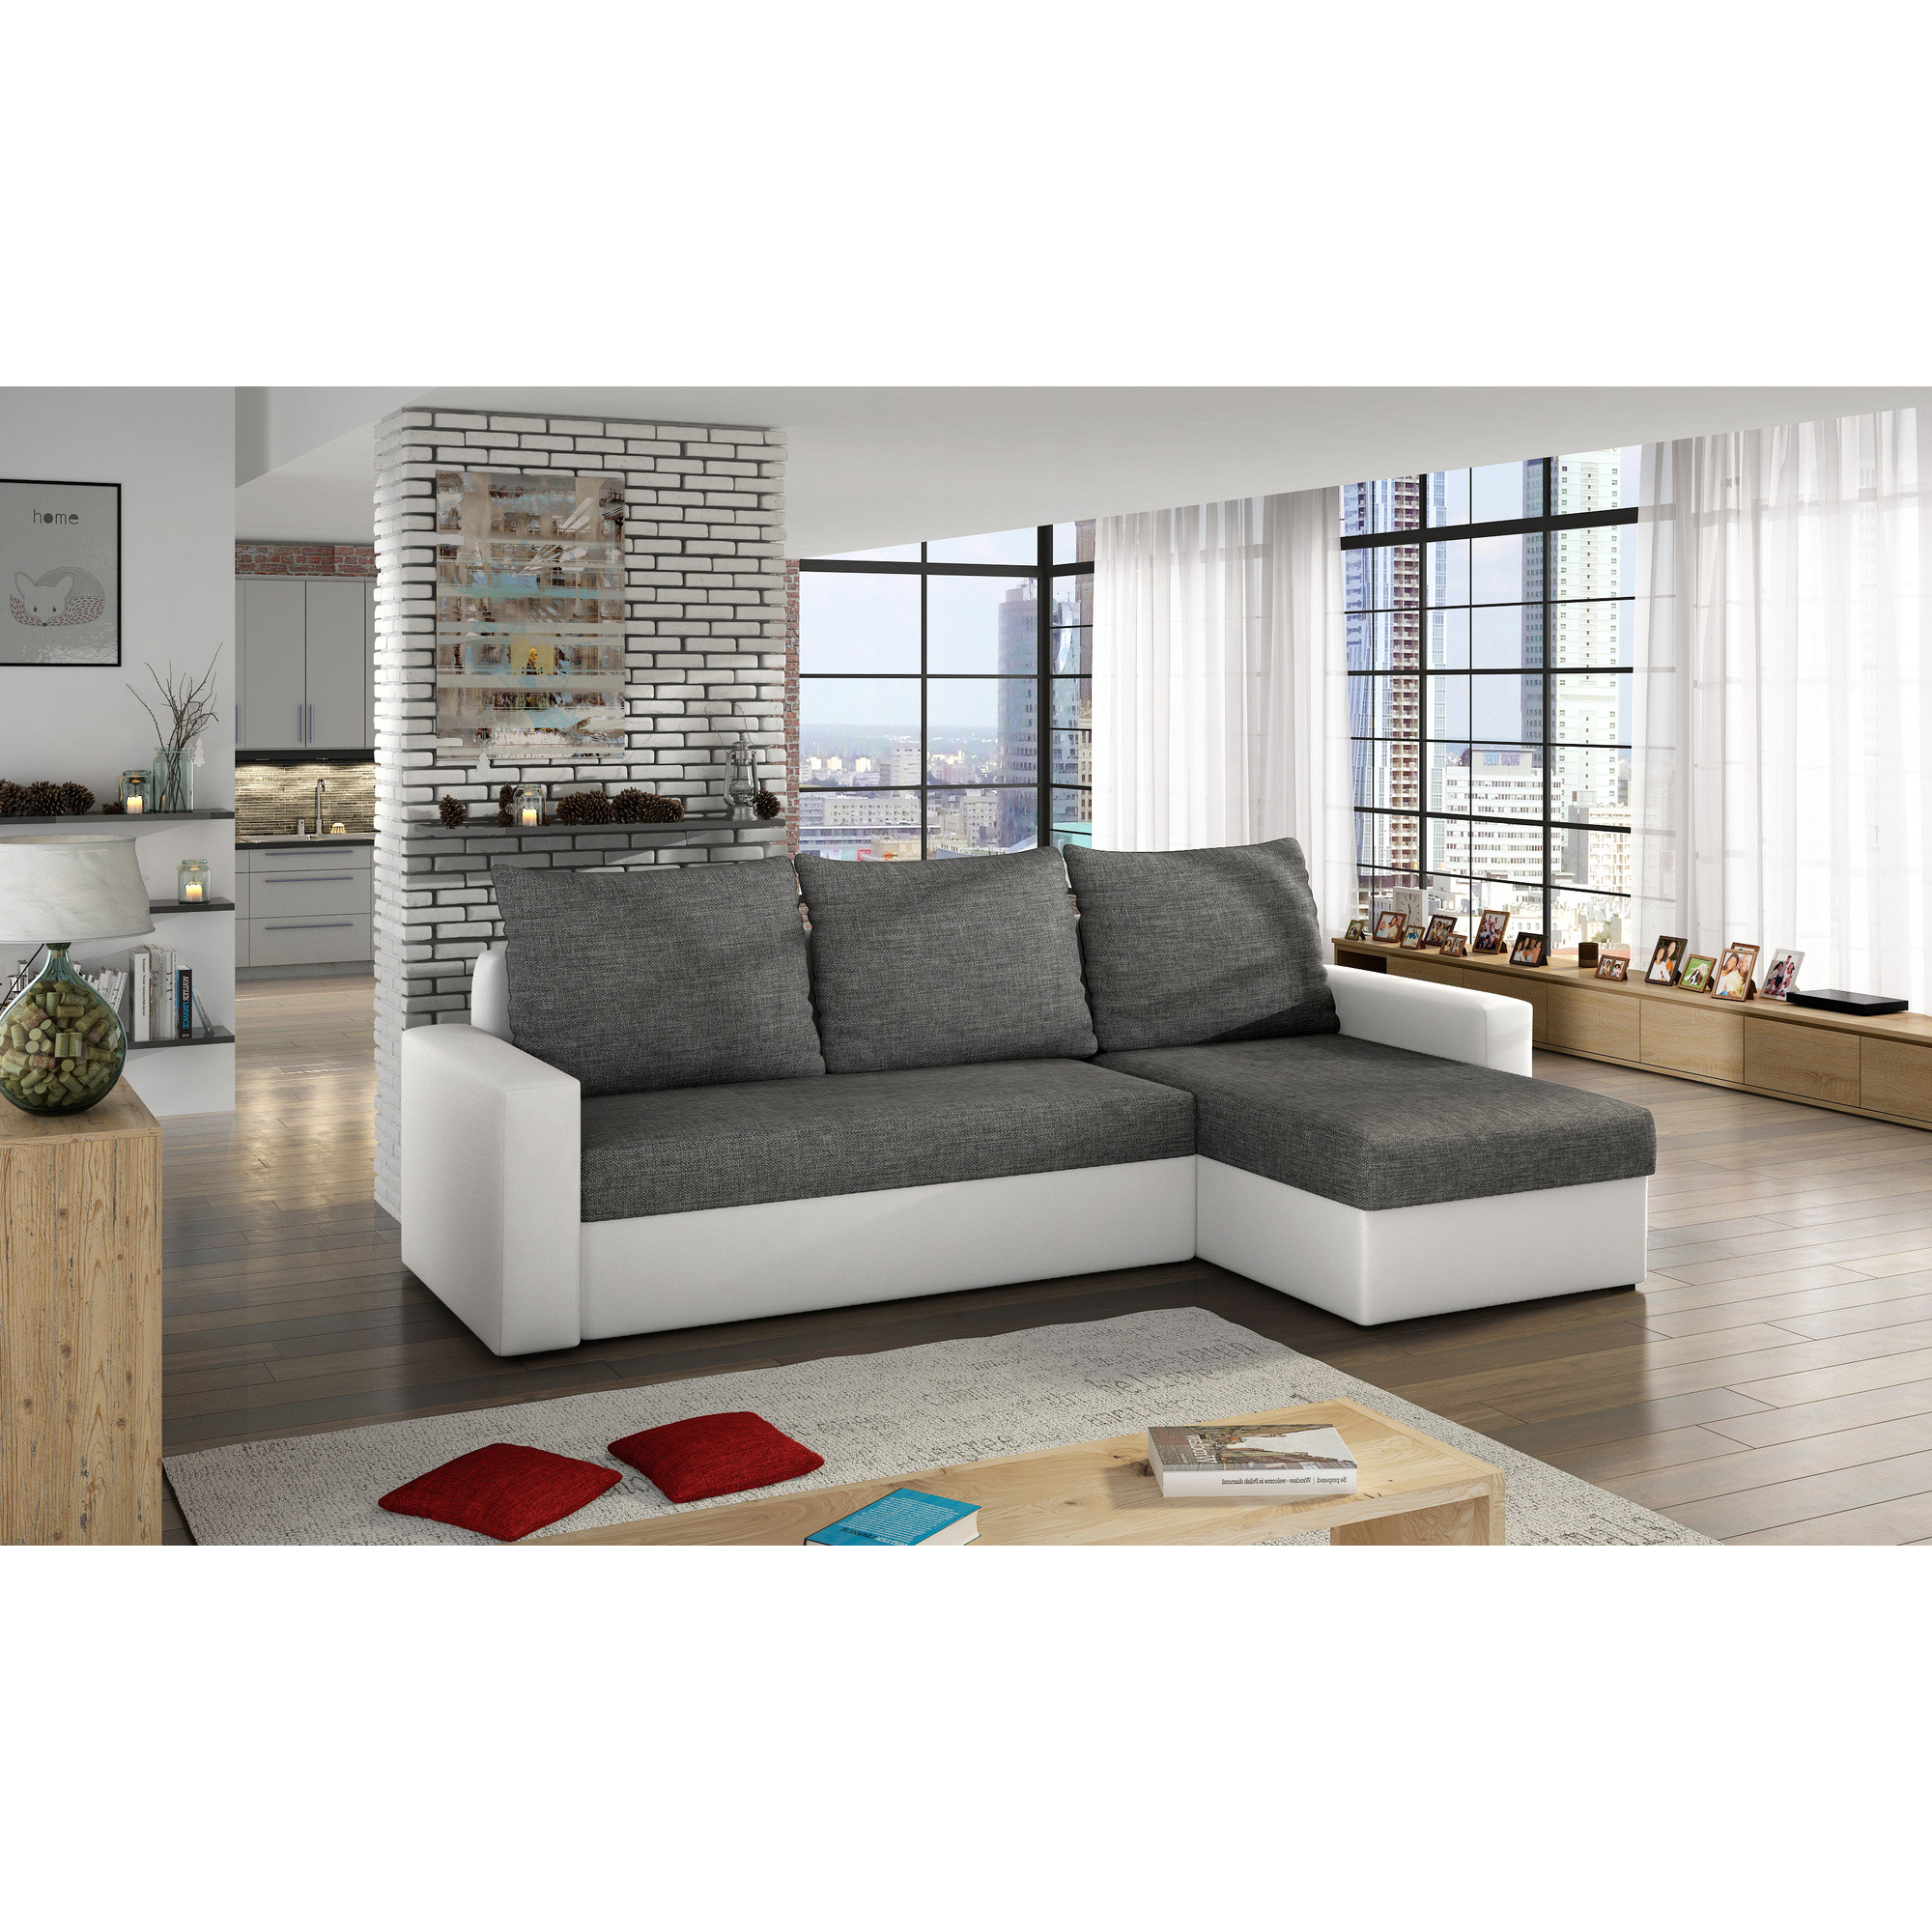 Canapé d angle convertible 3 places en simili cuir blanc